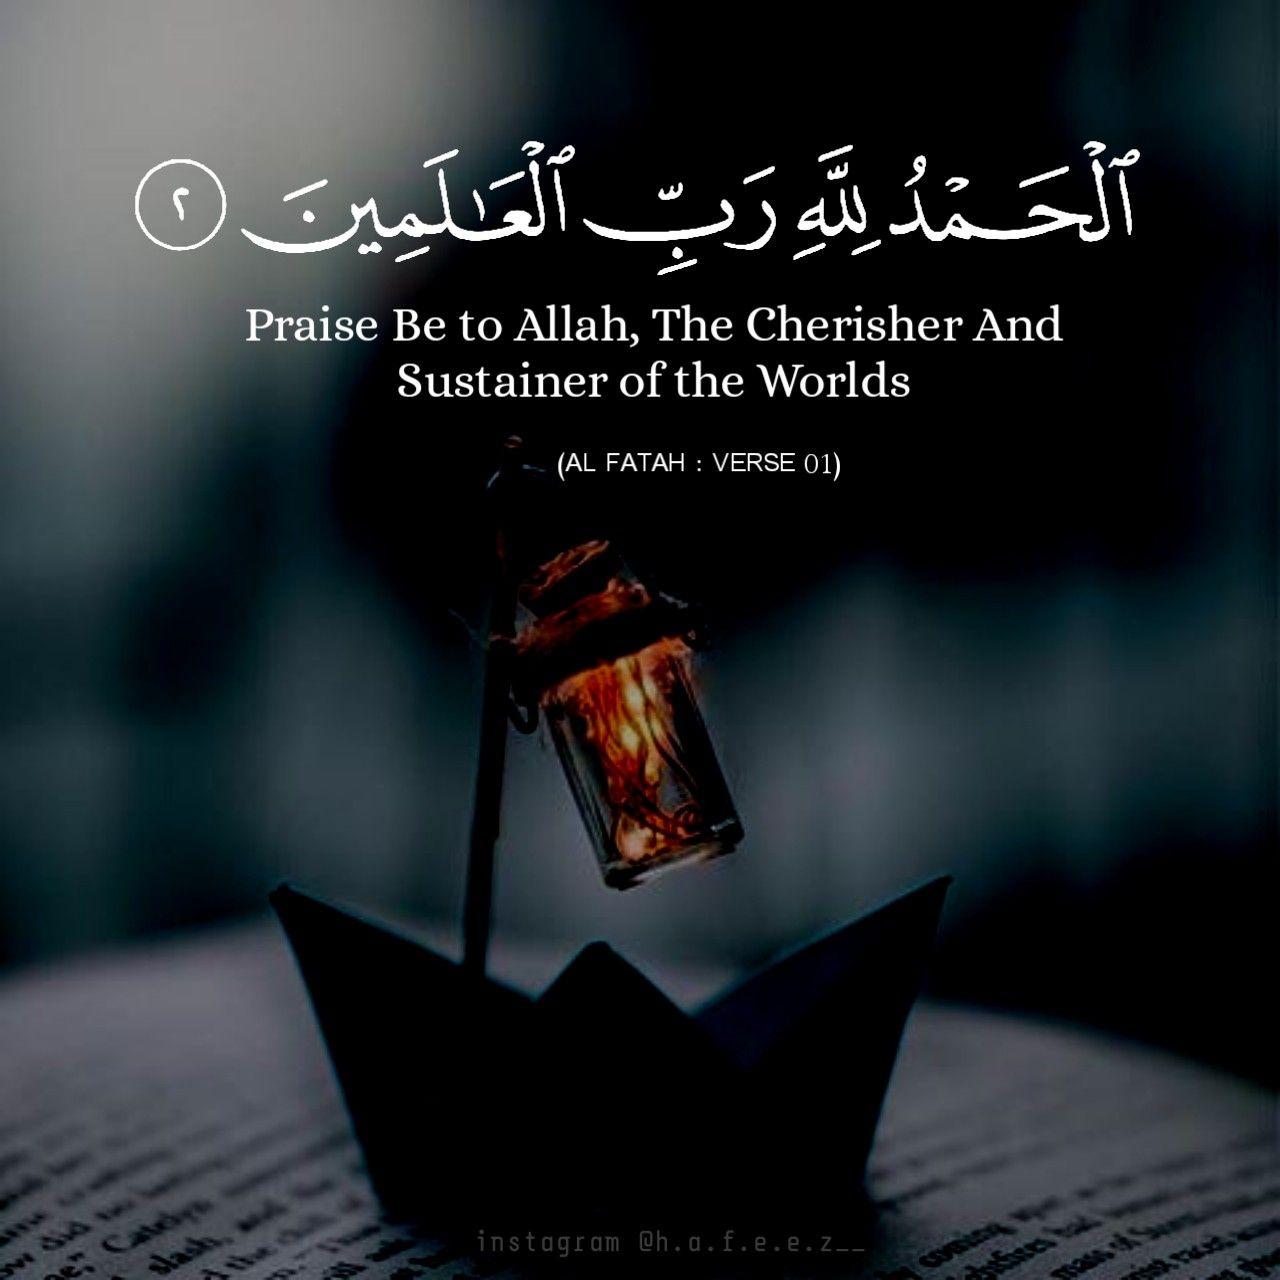 Pin By تدبروا القرآن الكريم On Muslim Quotes Quran Verses Islamic Teachings Quran Quotes